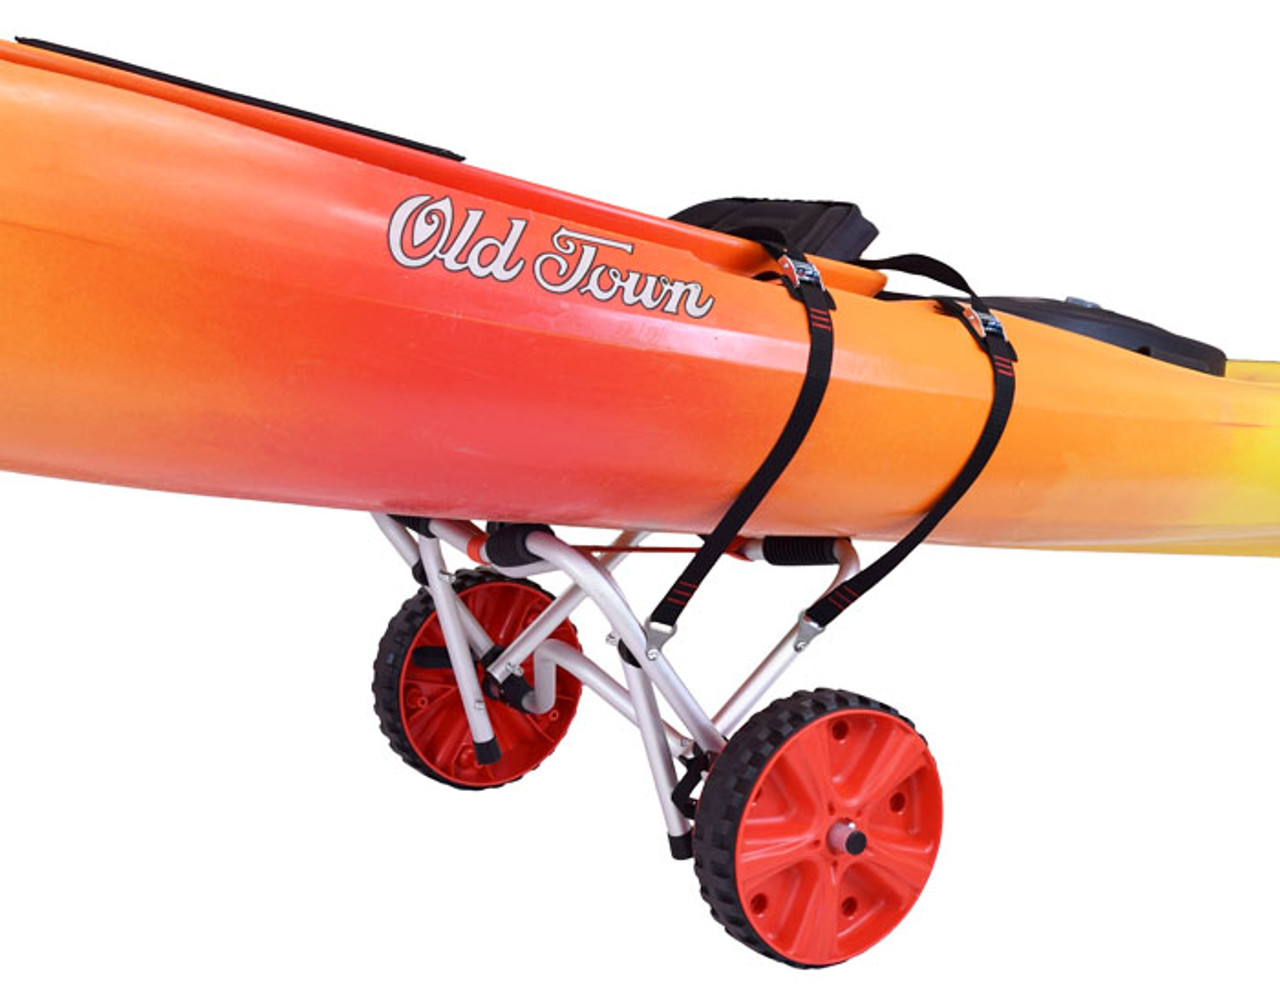 Clipper TRX Deluxe Kayak/Canoe Cart- No-Flat Tires (MPG522)